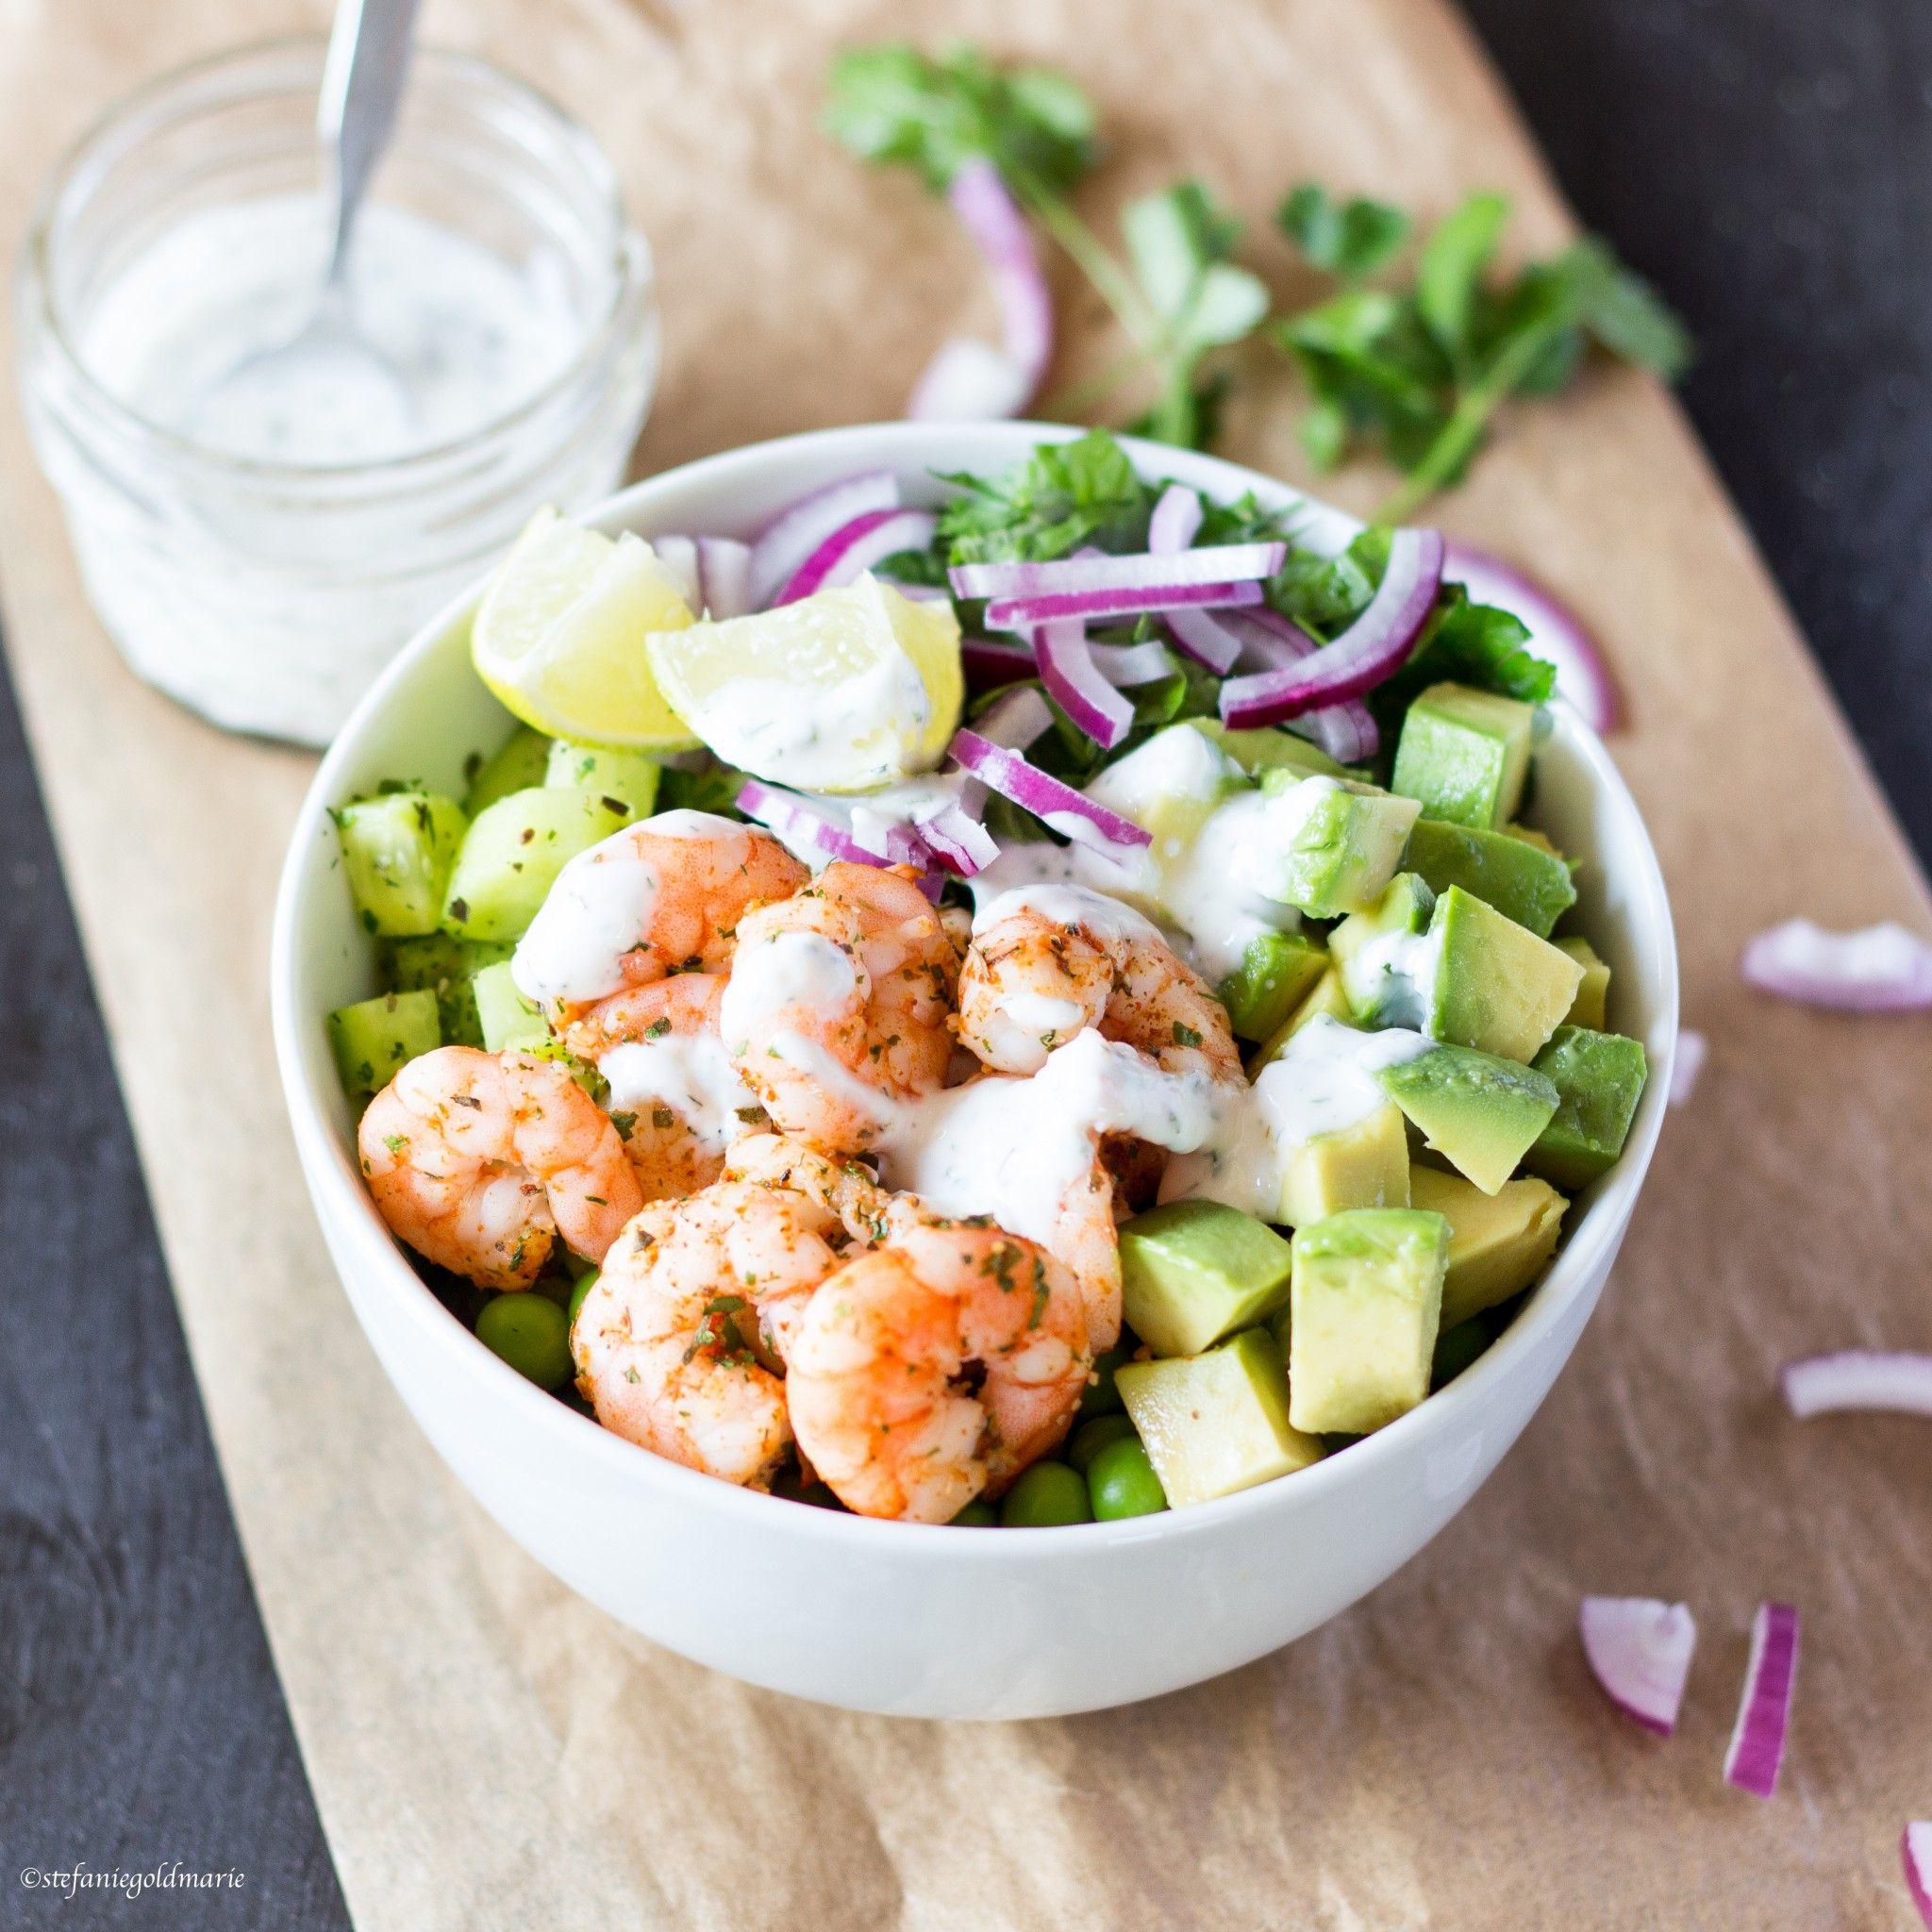 Green Salad Bowl with Prawns, Avocado and Yoghurt Dressing-perfect Summer Food